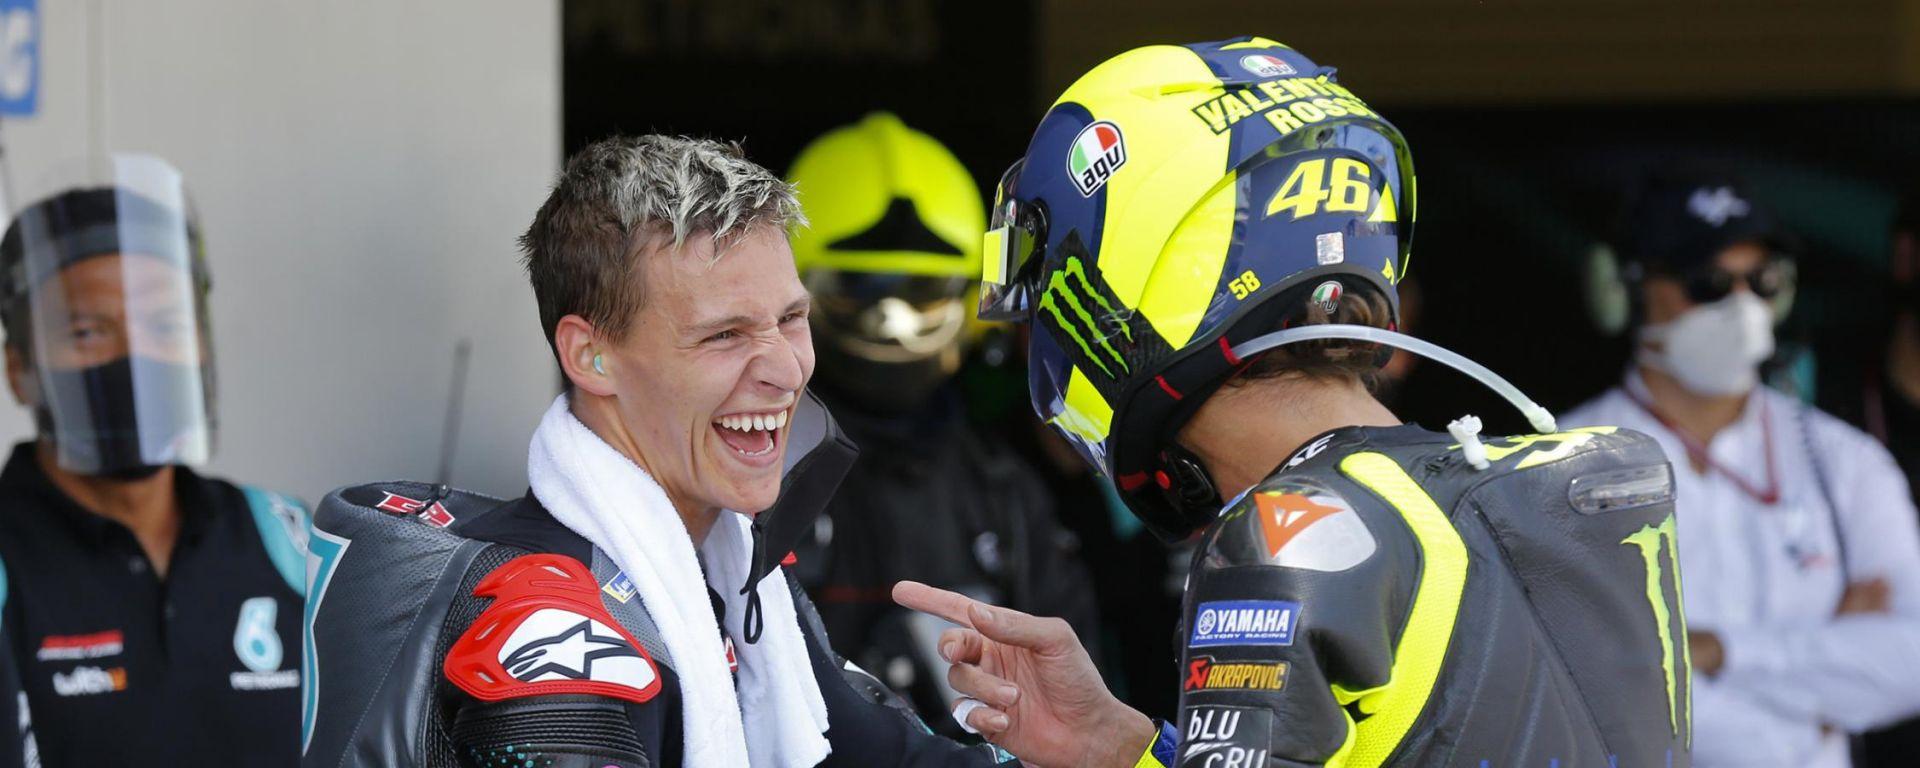 MotoGP Andalusia 2020, Jerez: Valentino Rossi (Yamaha) e Fabio Quartararo, insieme prima del podio